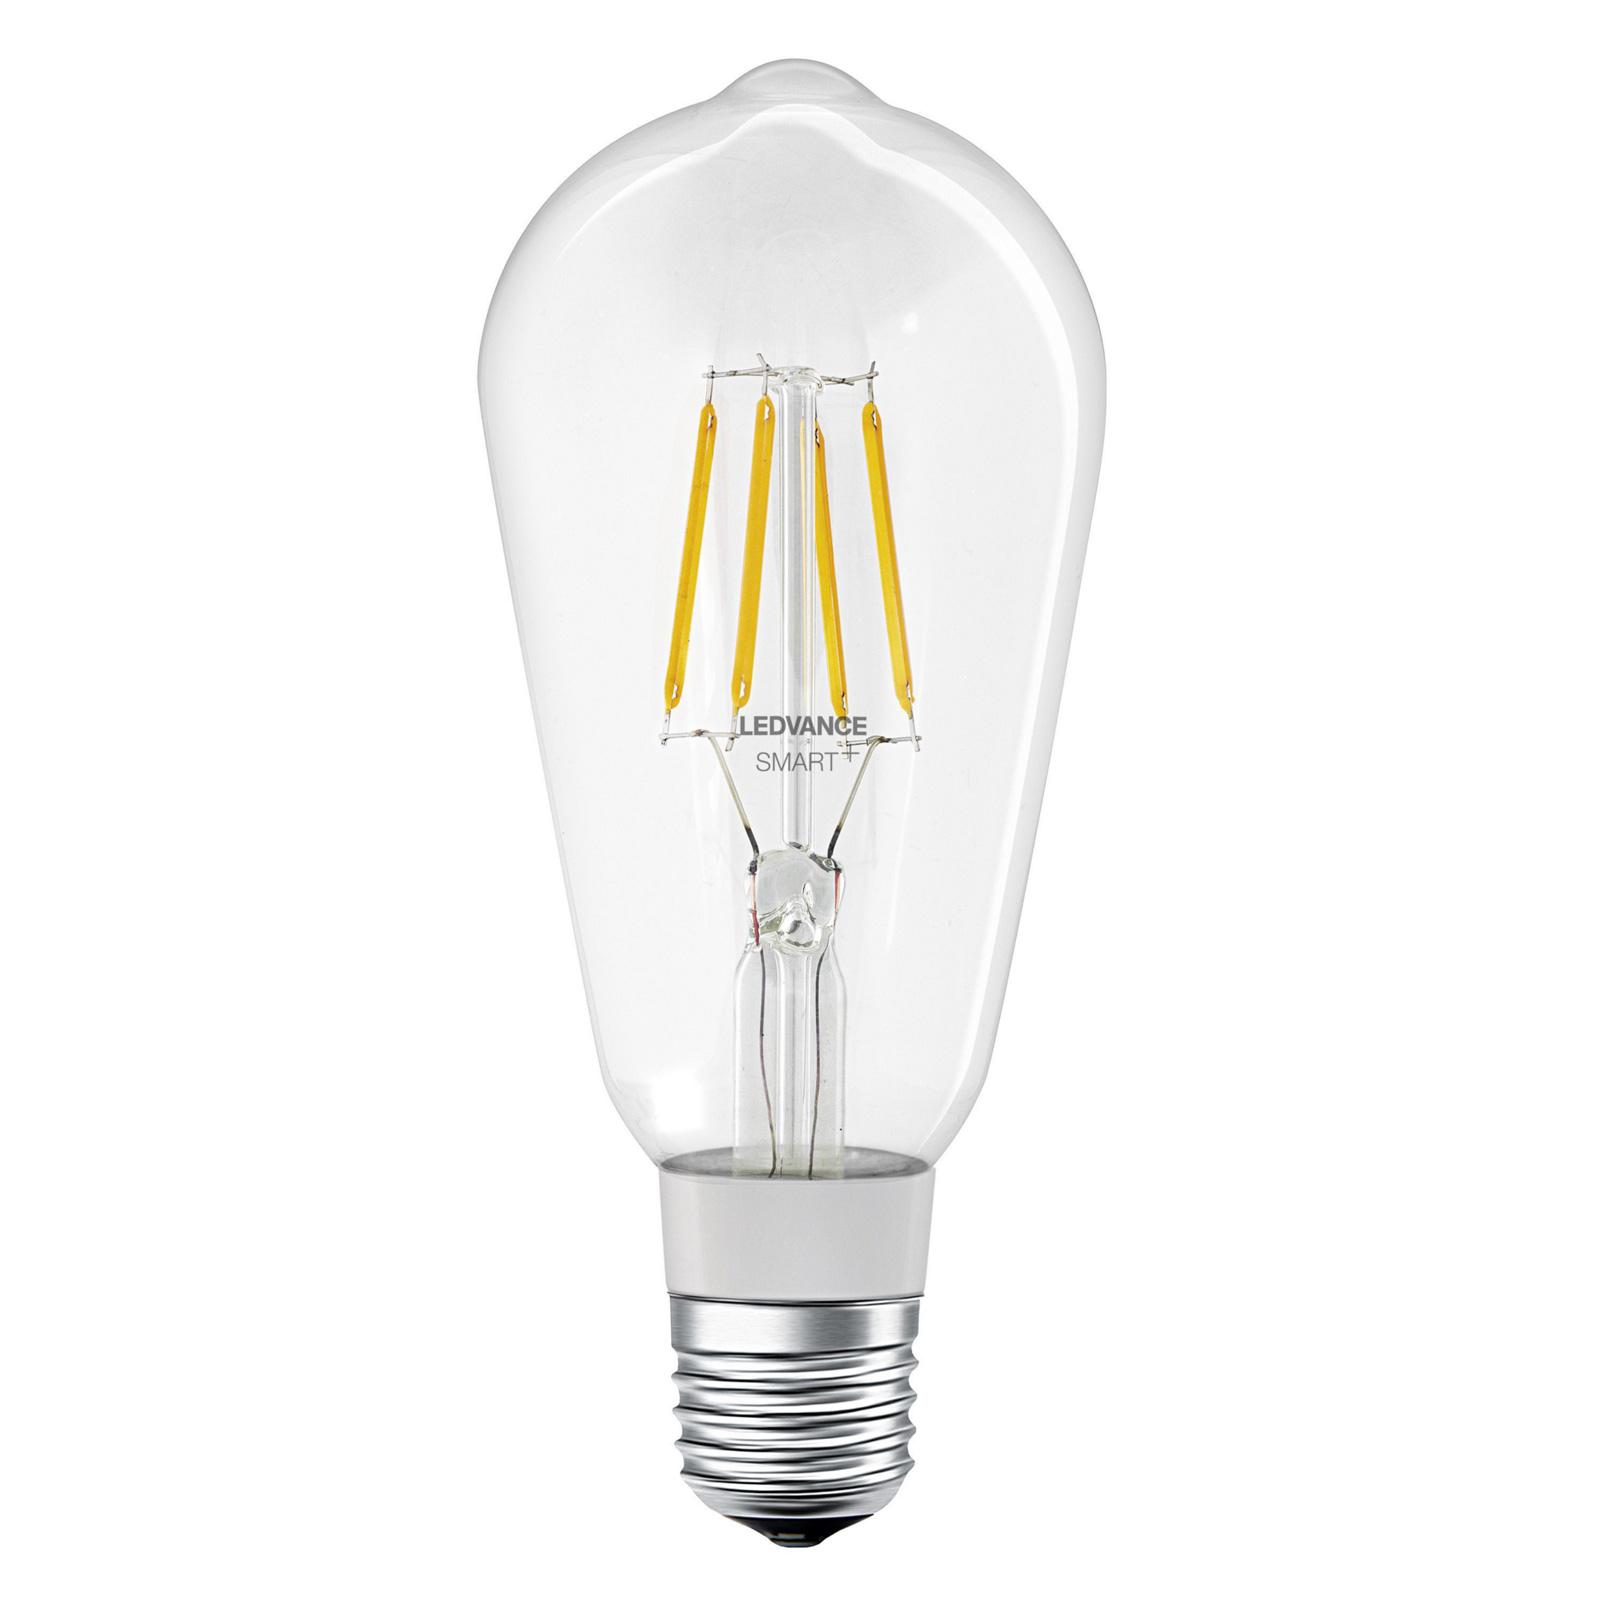 LEDVANCE SMART+ Bluetooth E27 Edison 5,5 W 2 700 K